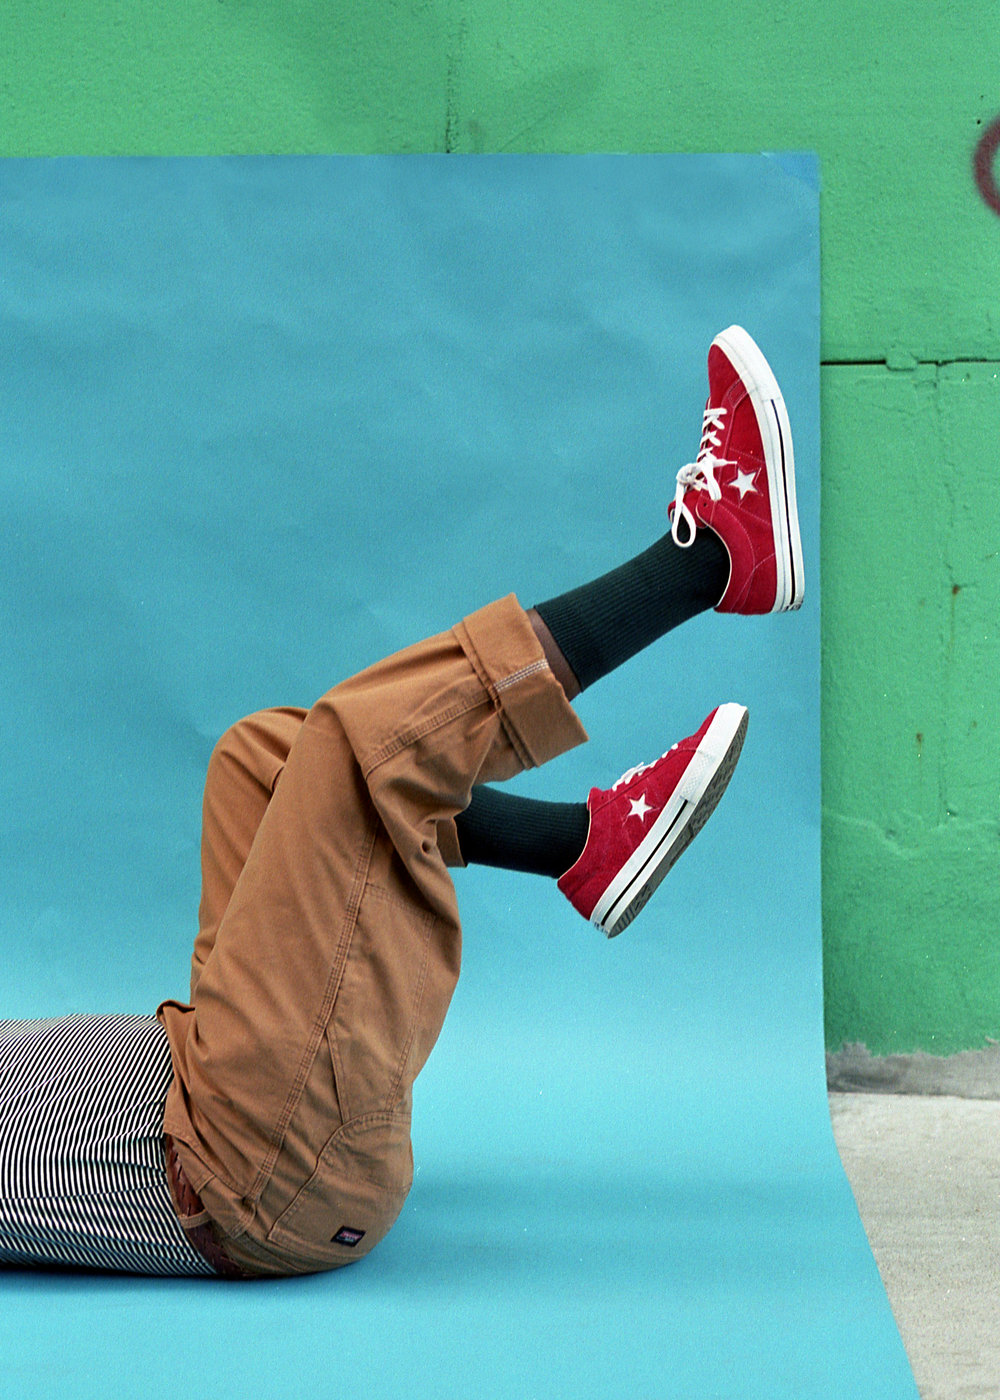 feetup.jpg